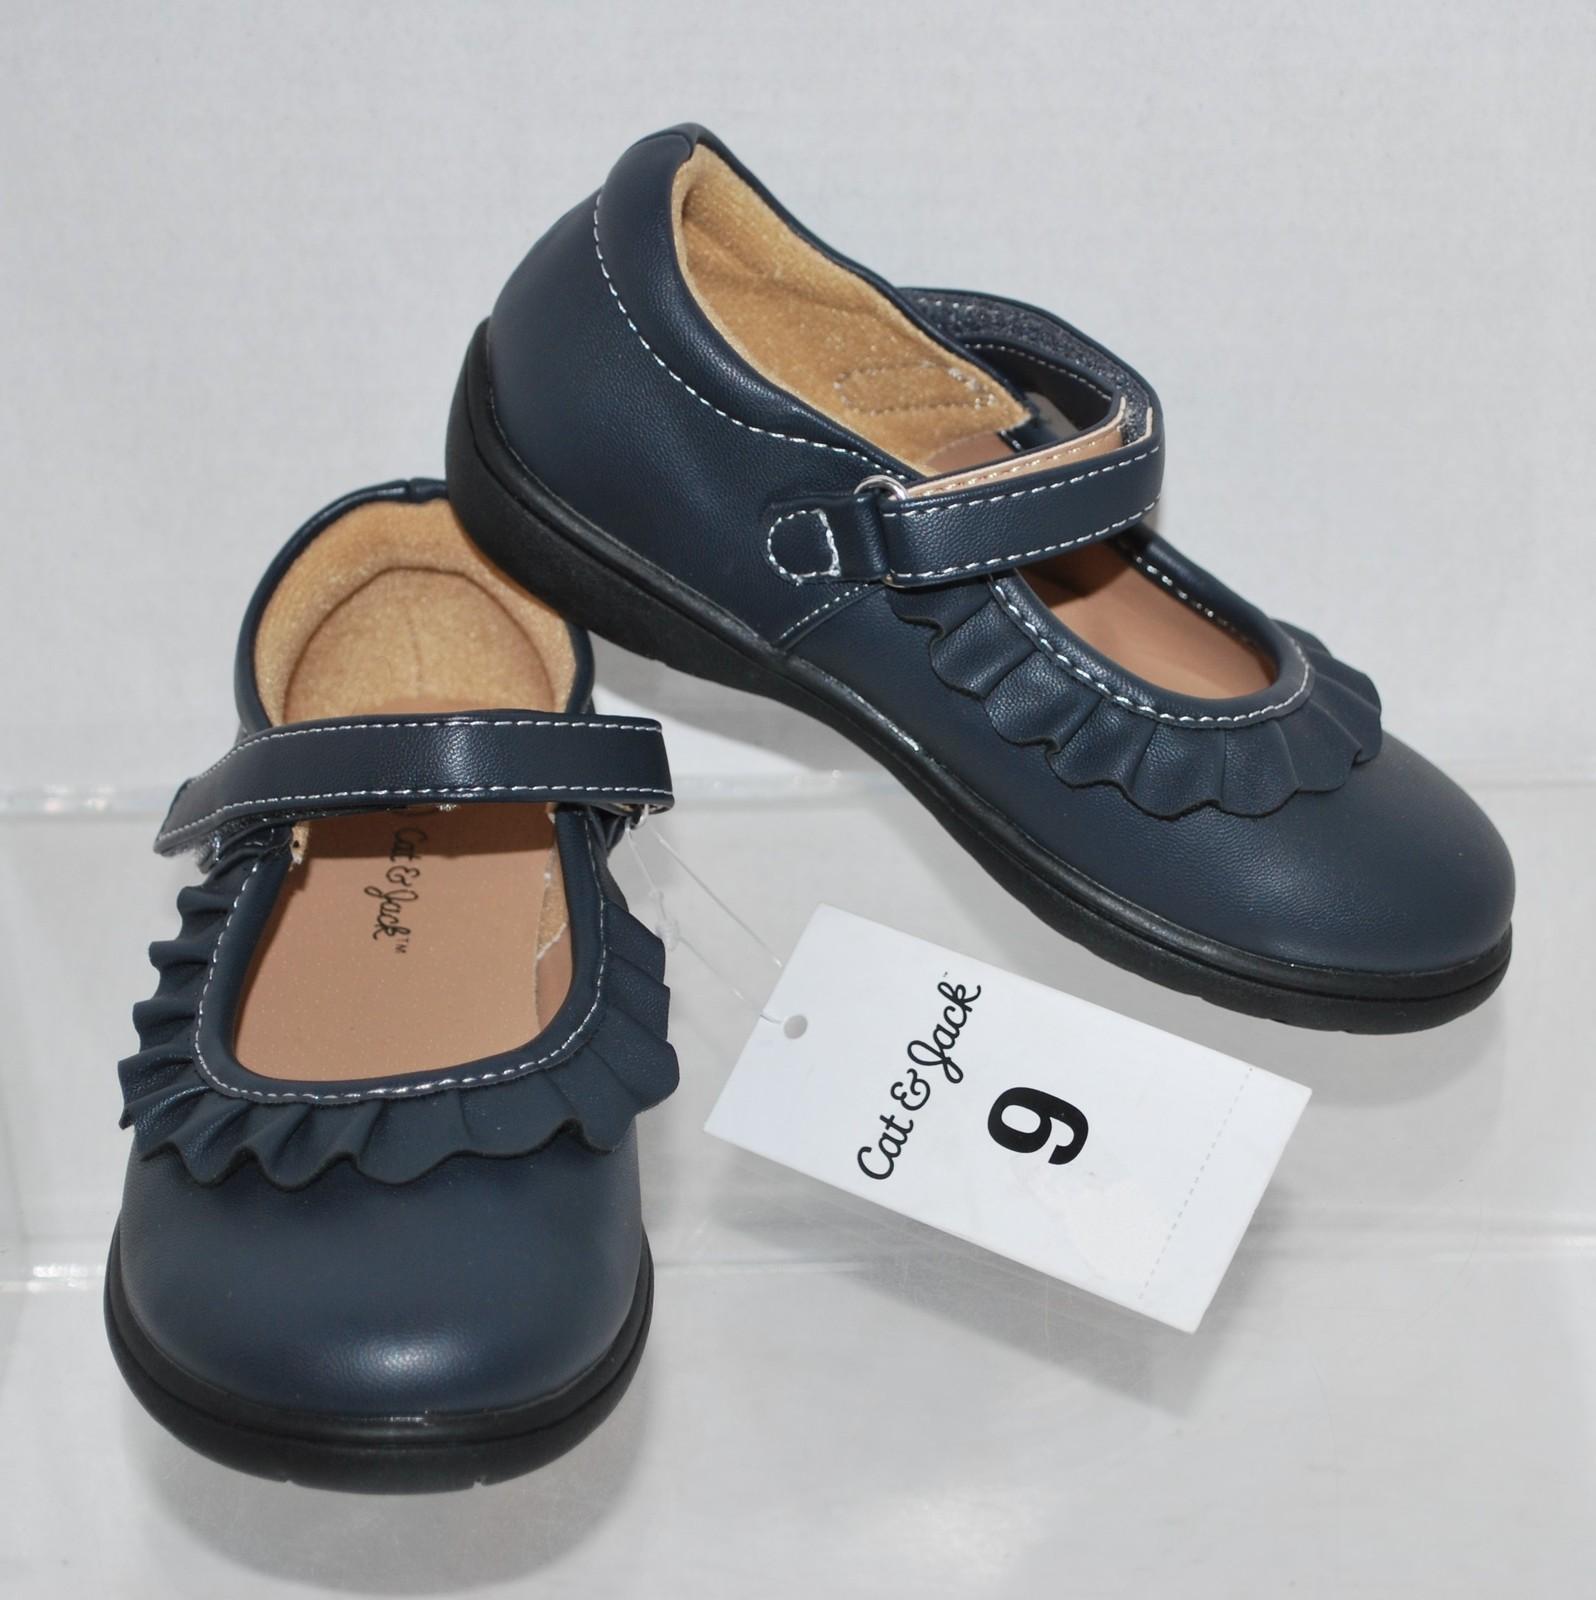 premium selection 8c14f 3fae9 Toddler Girls  Dottie Black Mary Jane Shoes - Cat   Jack - Size 9